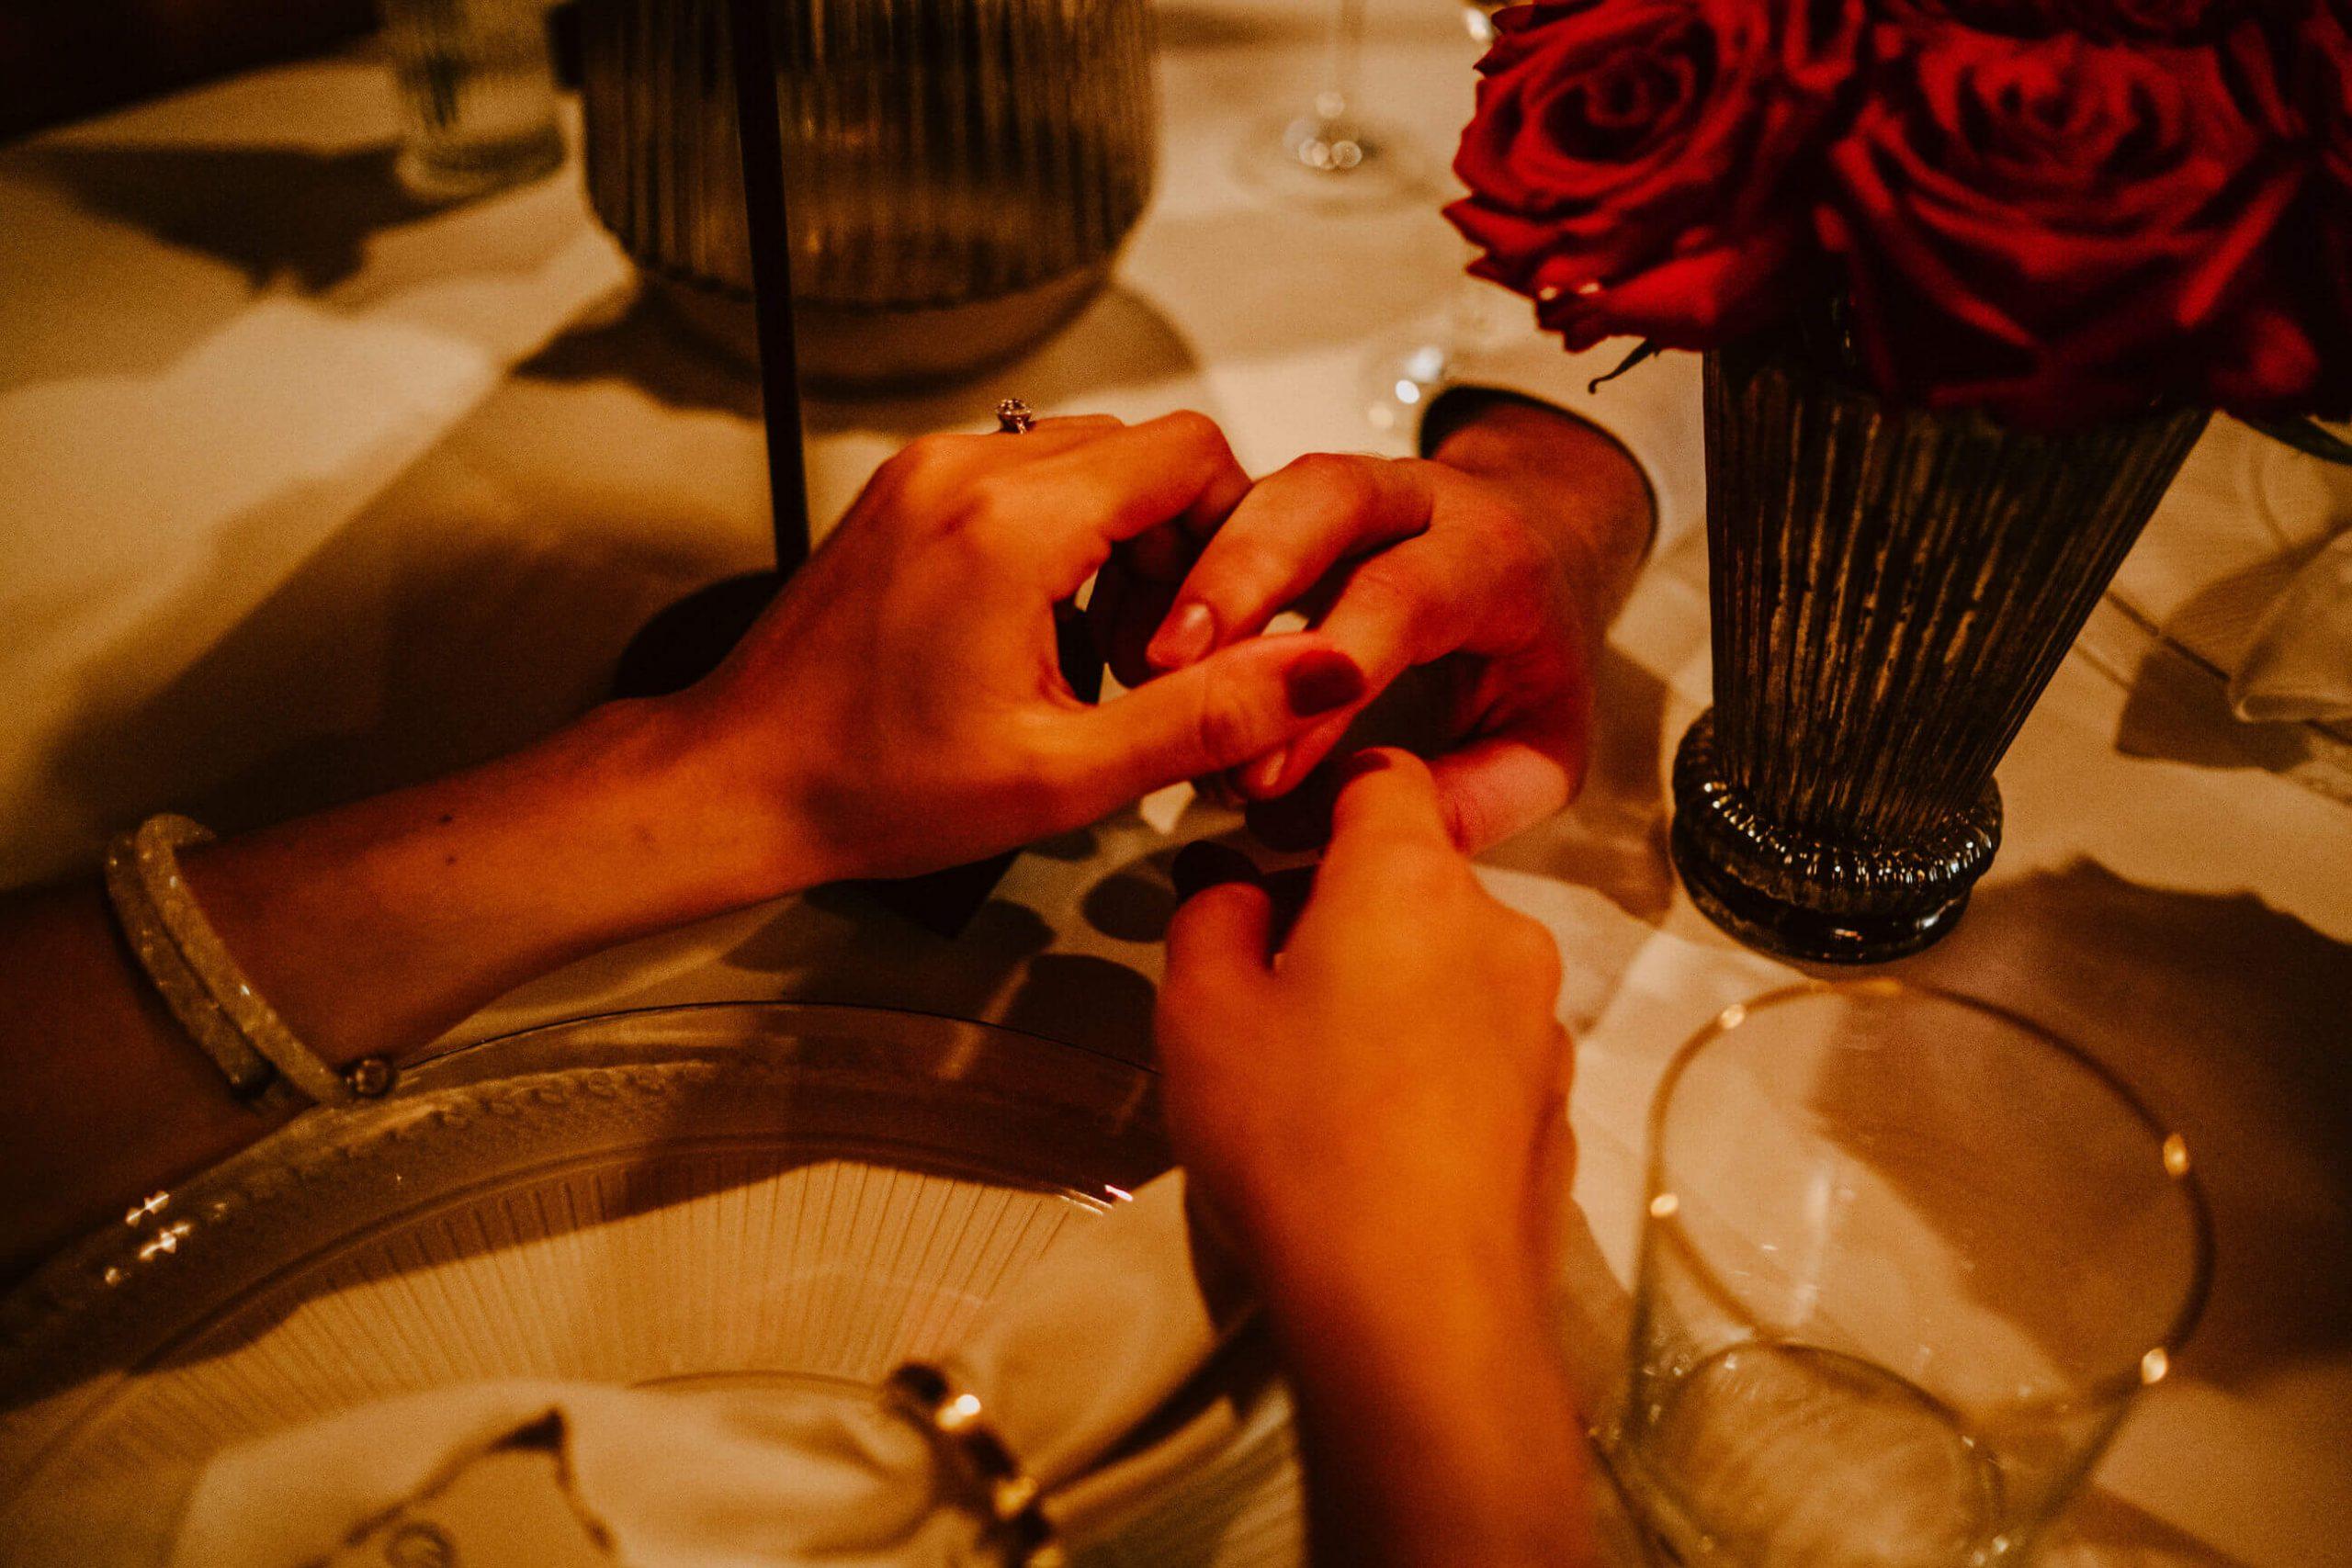 roma-organizacao-eventos-pedido-casamento-casa-de-cha-da-boa-nova-porto-portugal-28